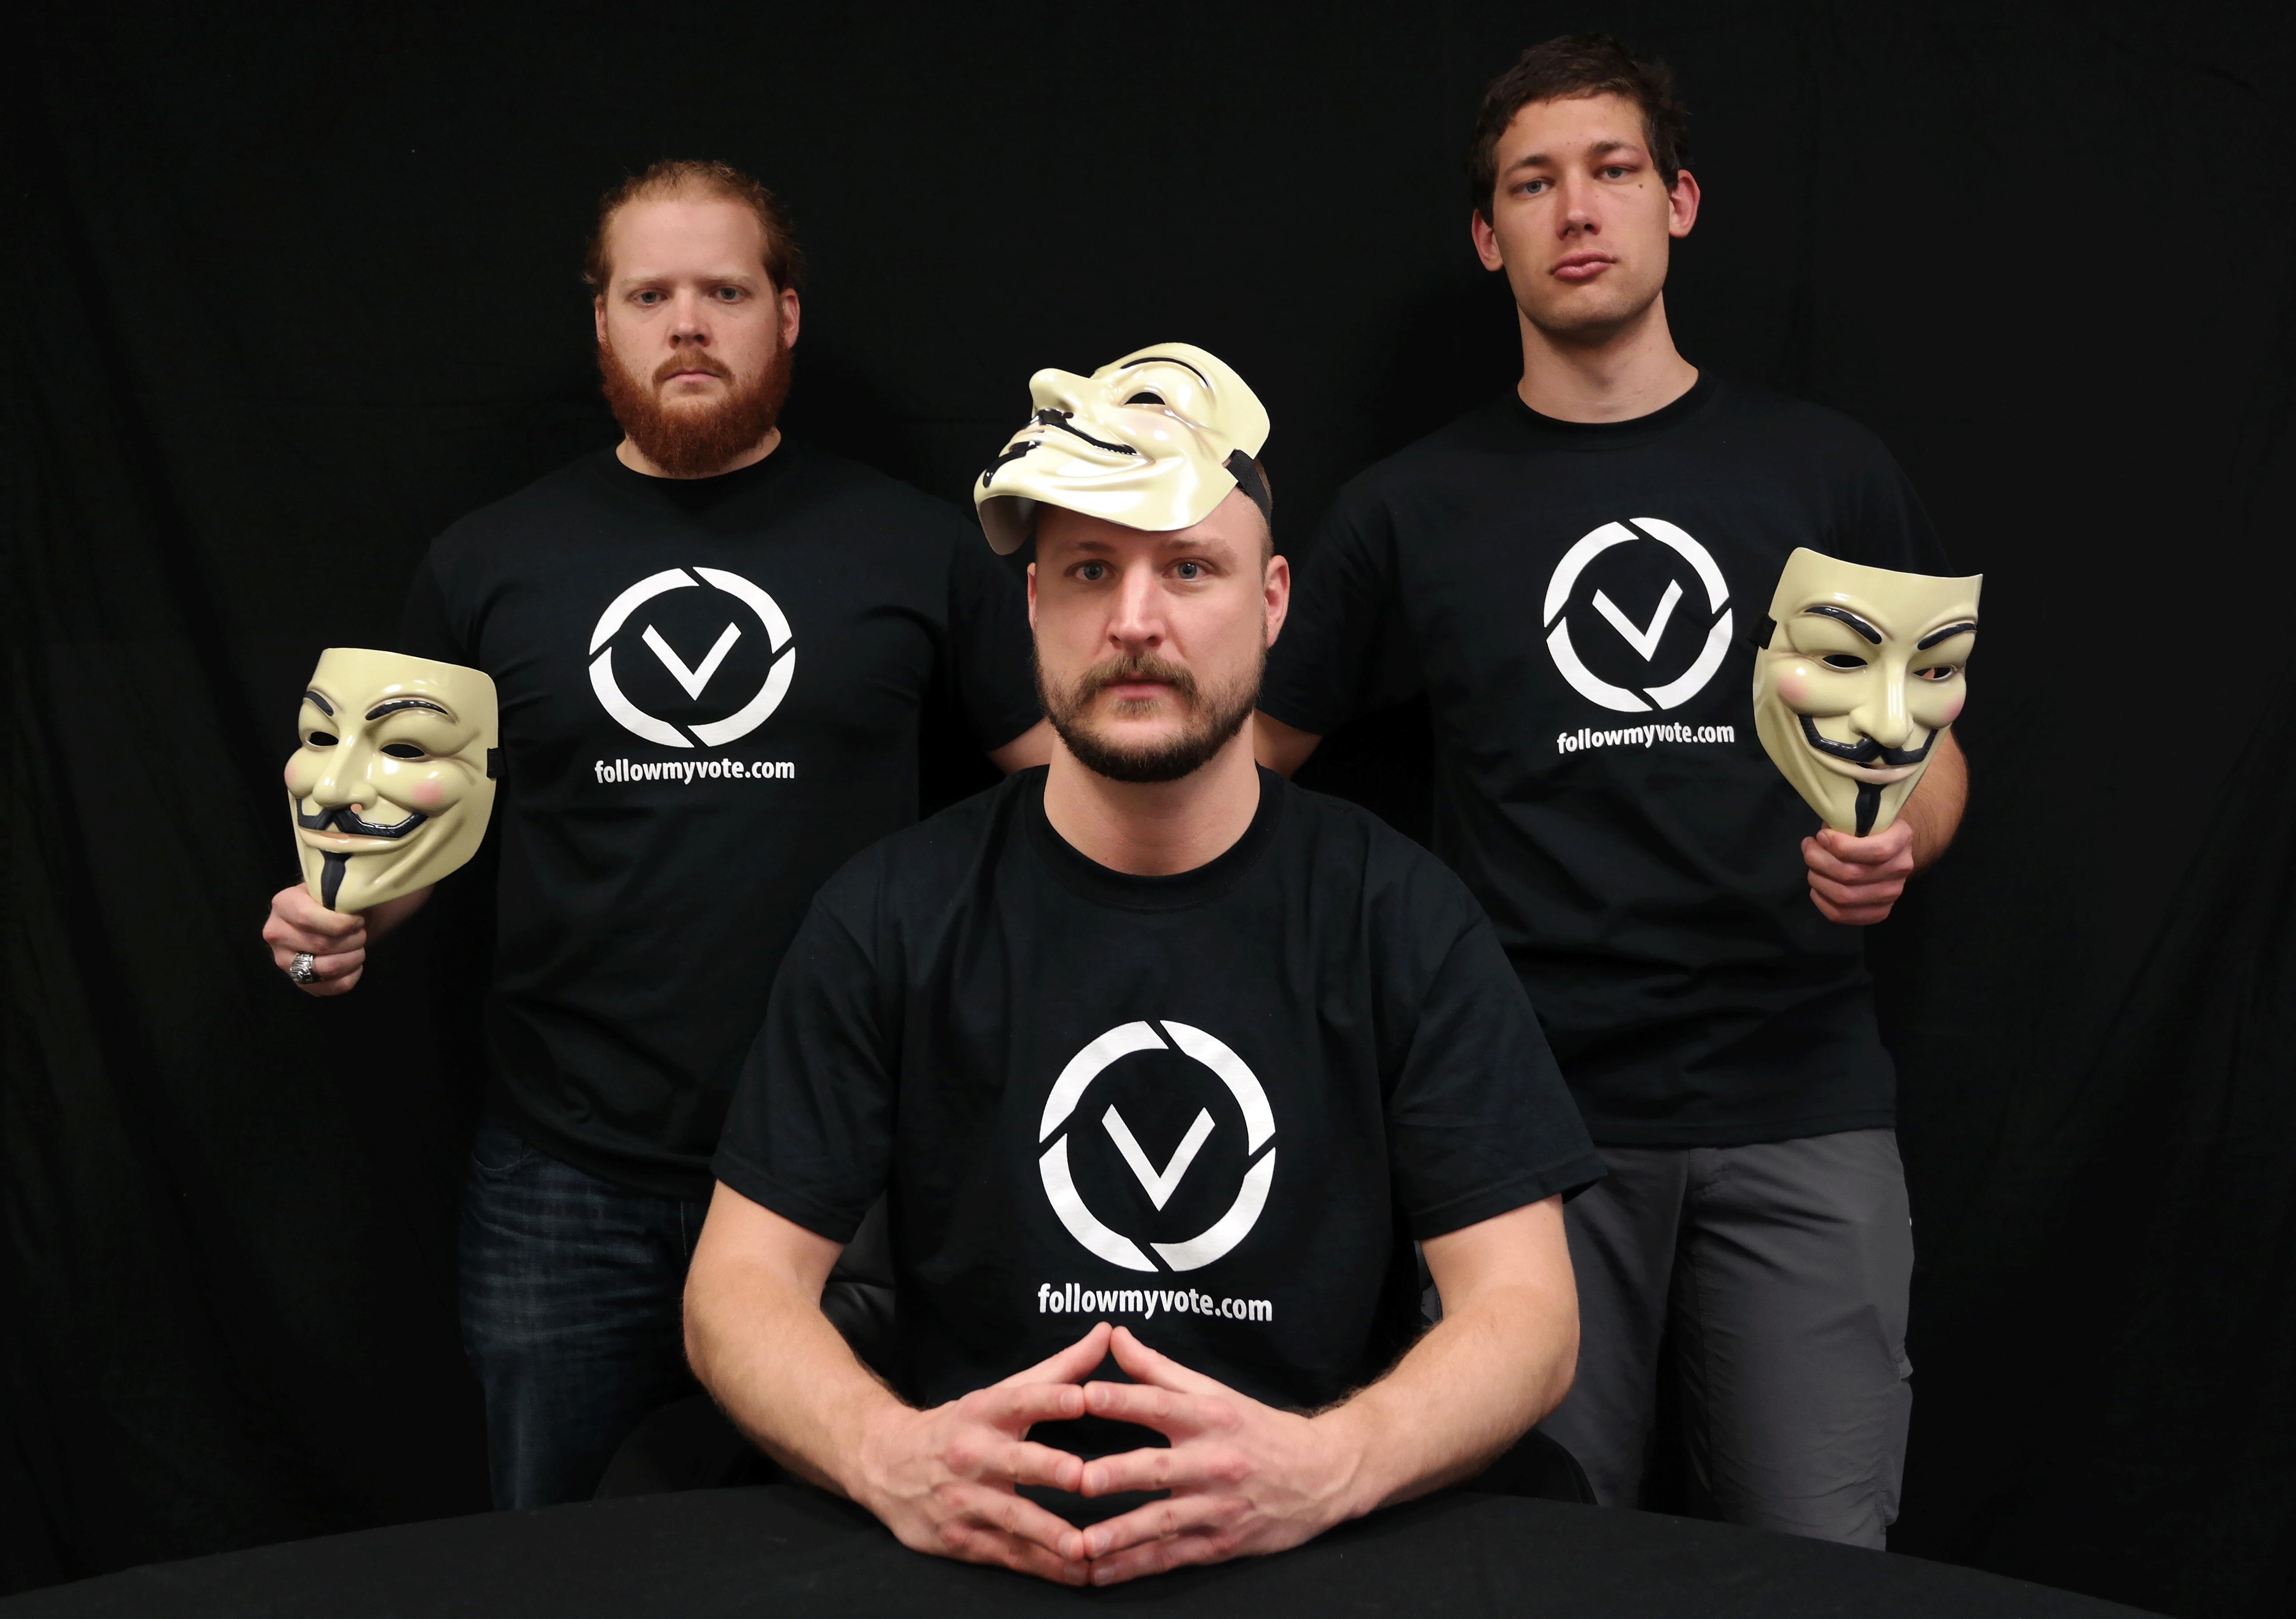 V-For-Vendetta-Follow-My-Vote-Team